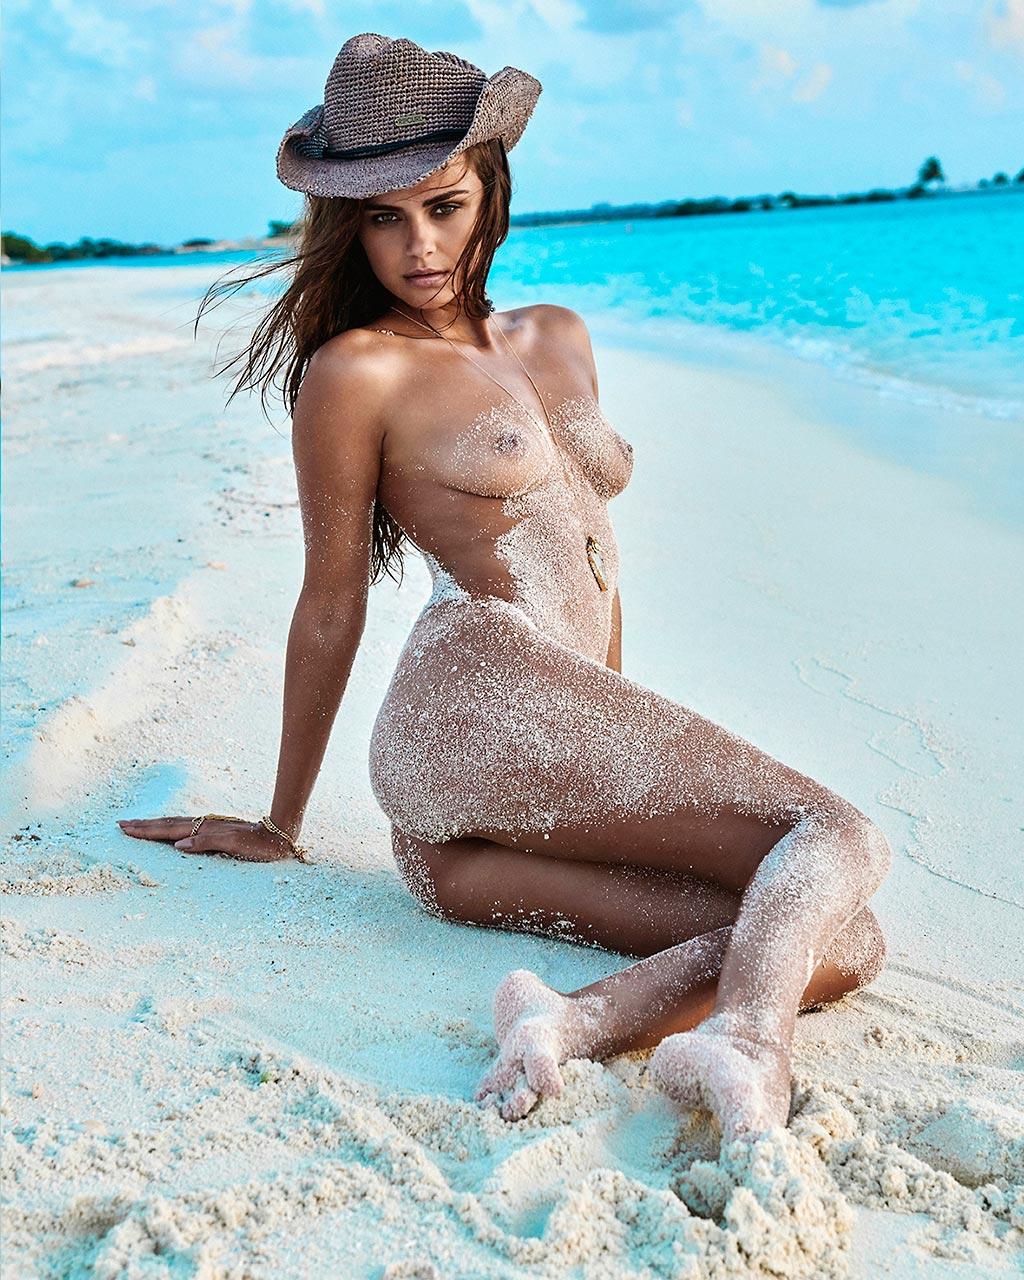 Sex Xenia Deli naked (28 photo), Tits, Hot, Selfie, butt 2015